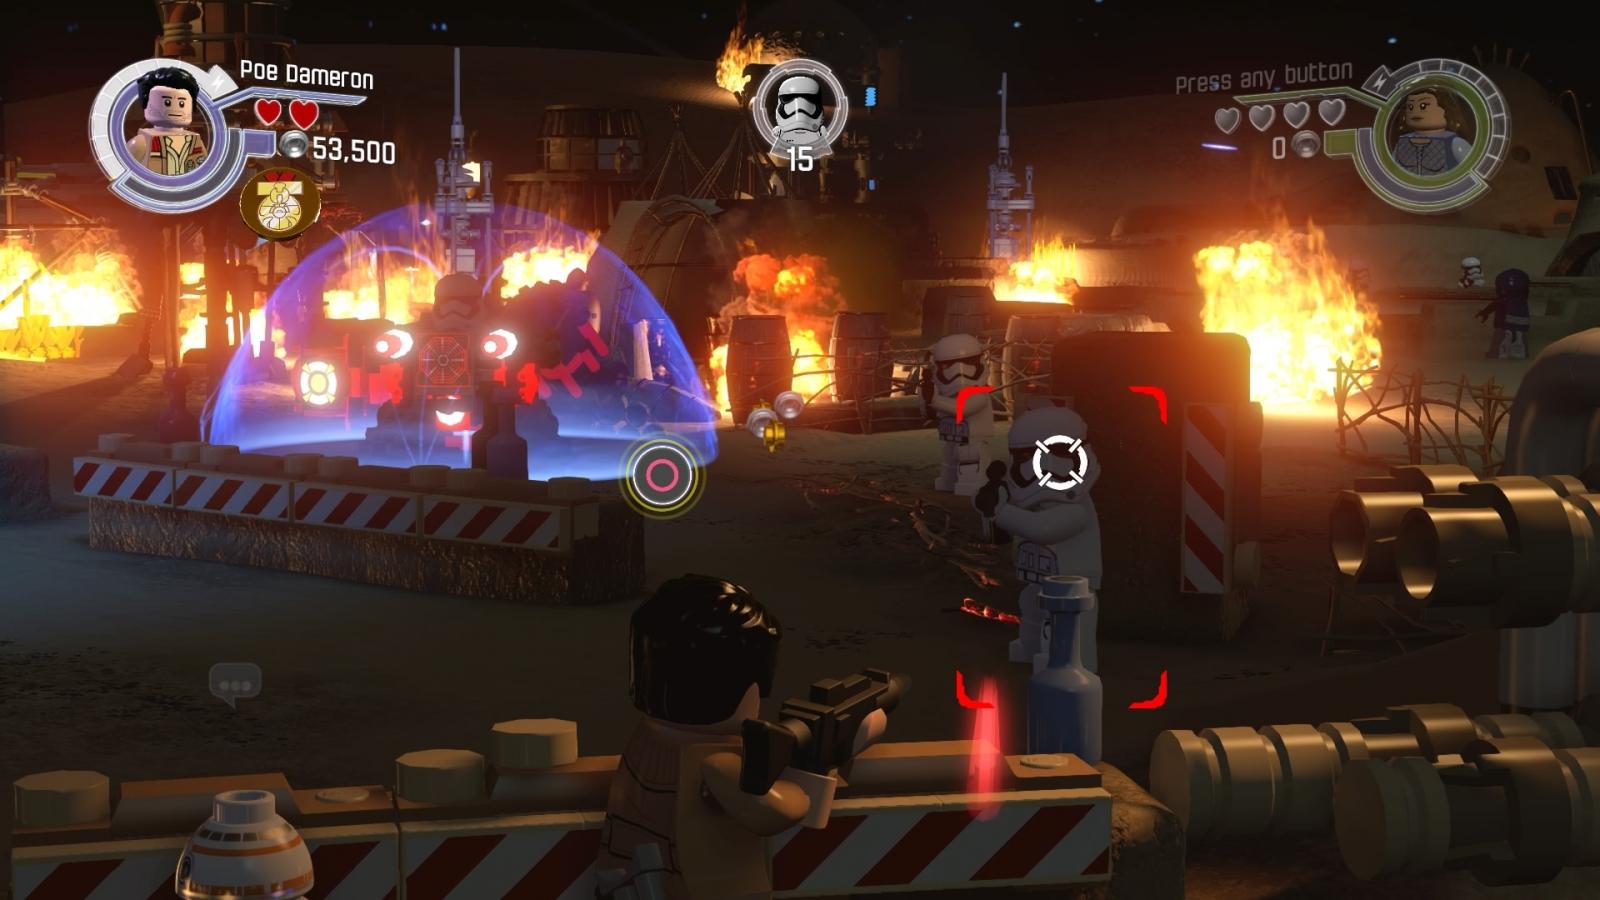 Lego Star Wars Force Awakens Blaster Battle